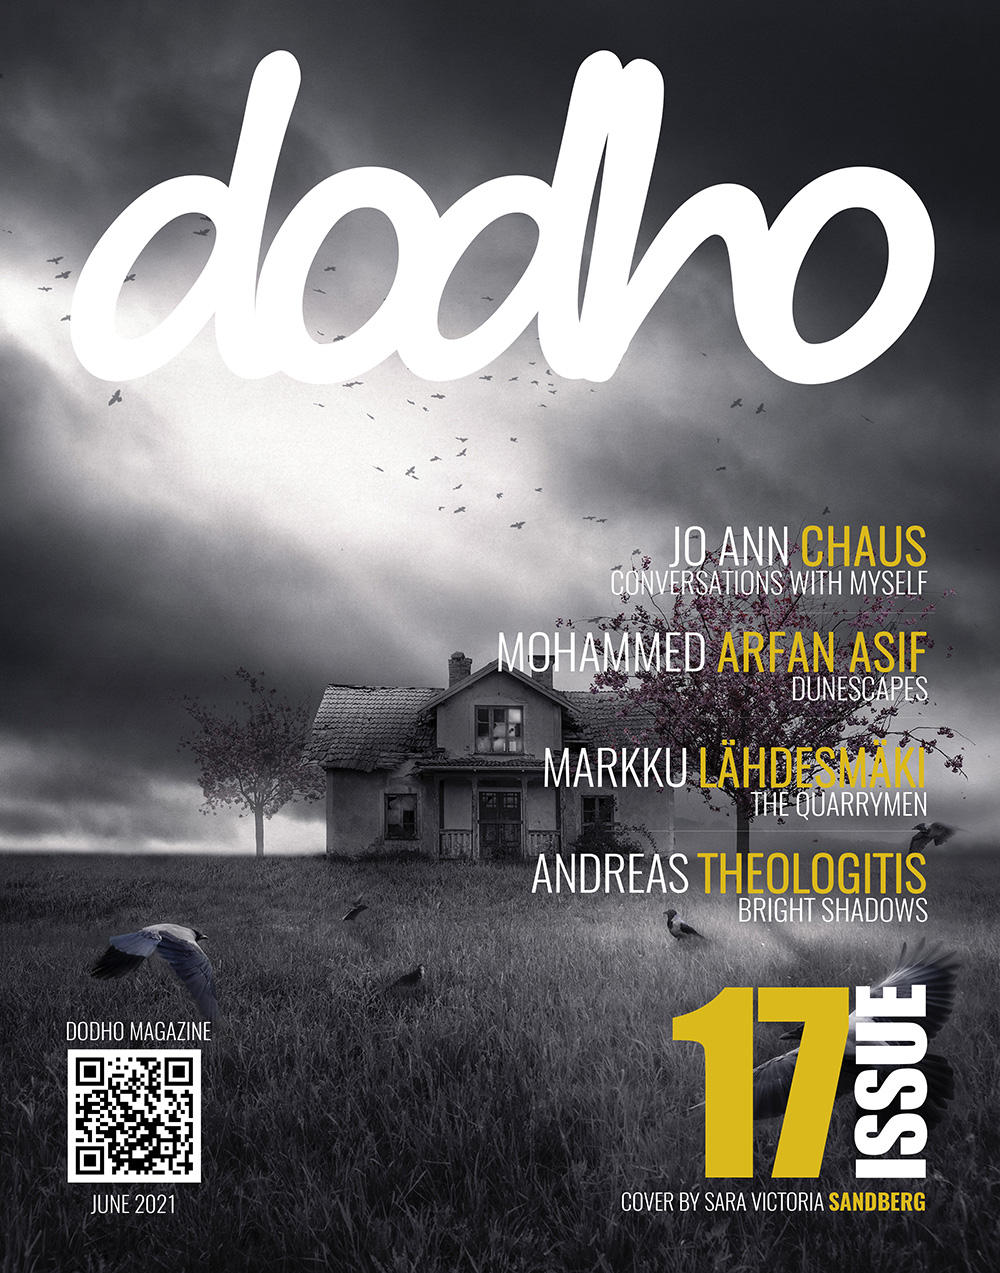 https://www.dodho.com/wp-content/uploads/2021/06/Mcover17.jpg